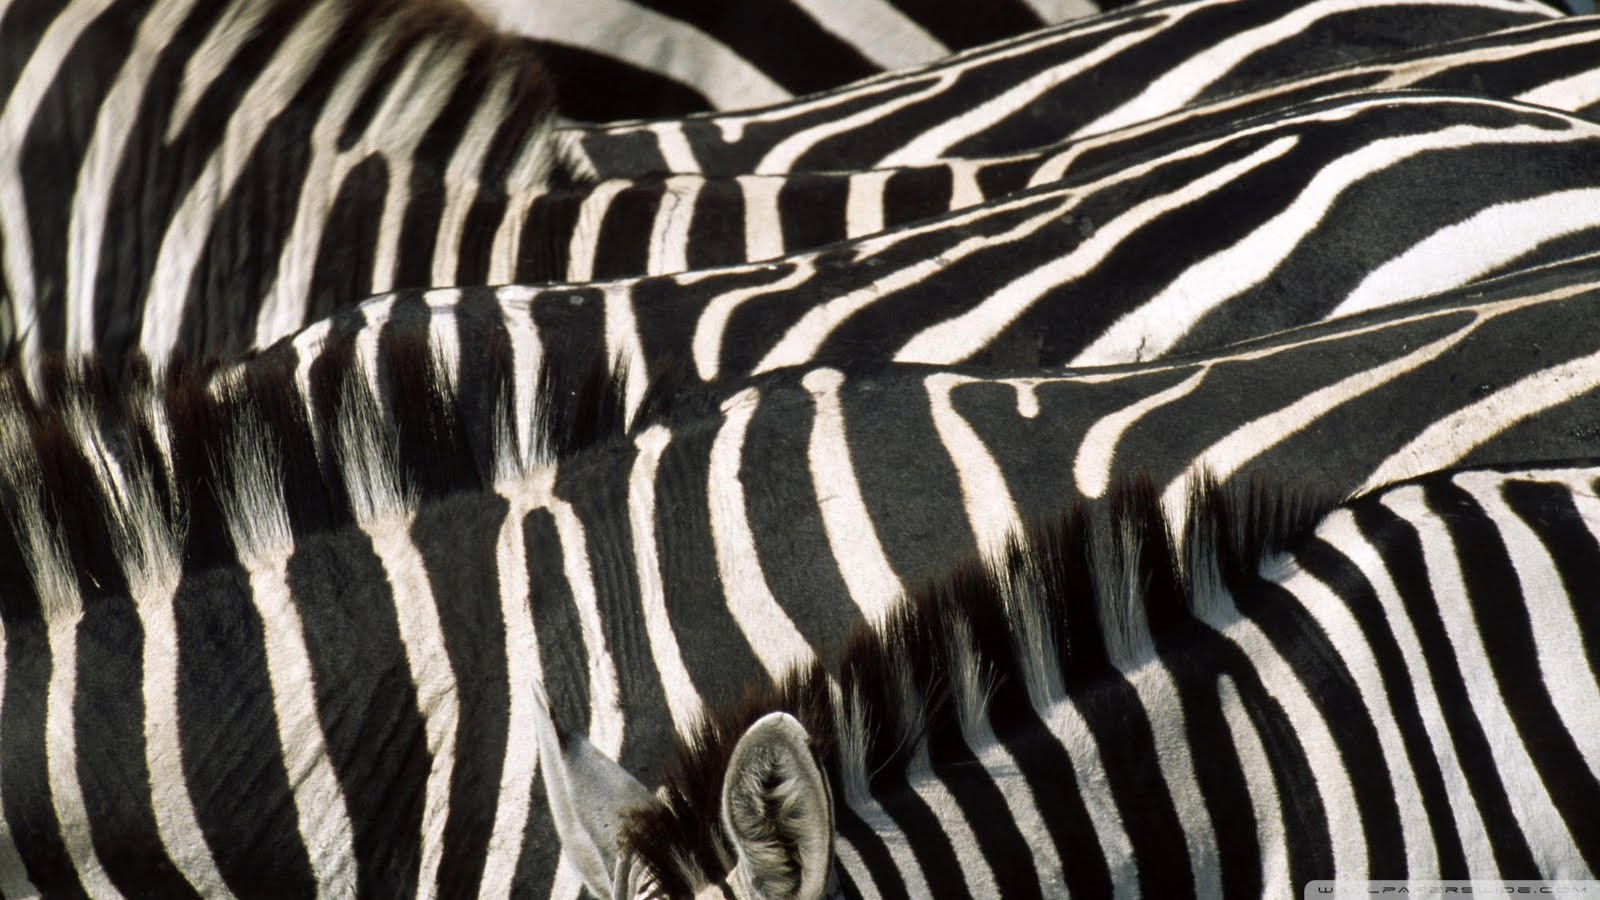 zebra wallpapers zebra images zebra photos zebra pictures